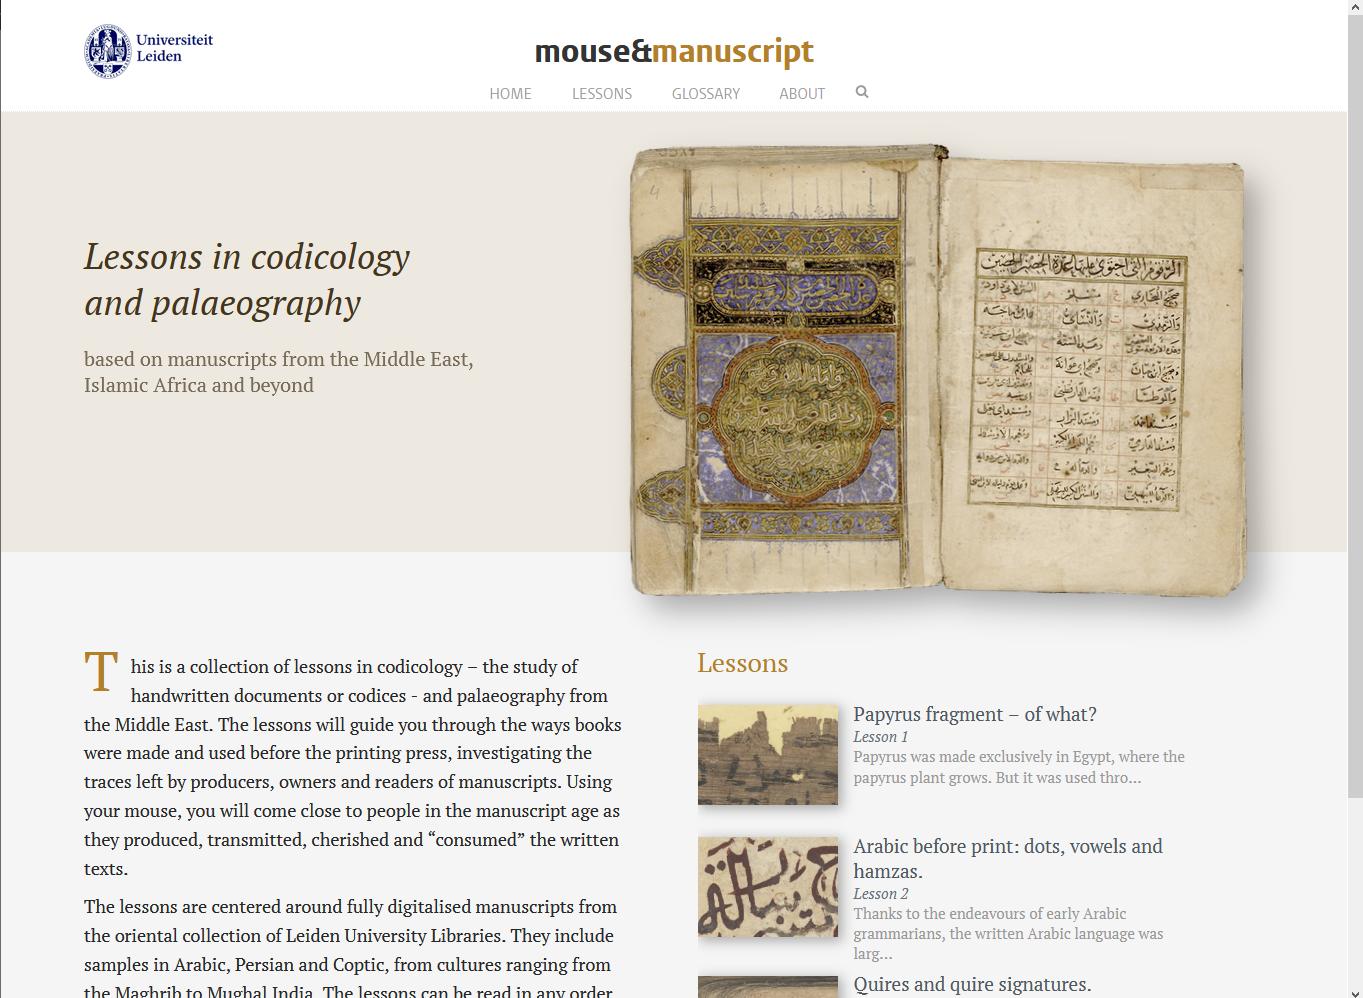 201112 Mouse and manuscript